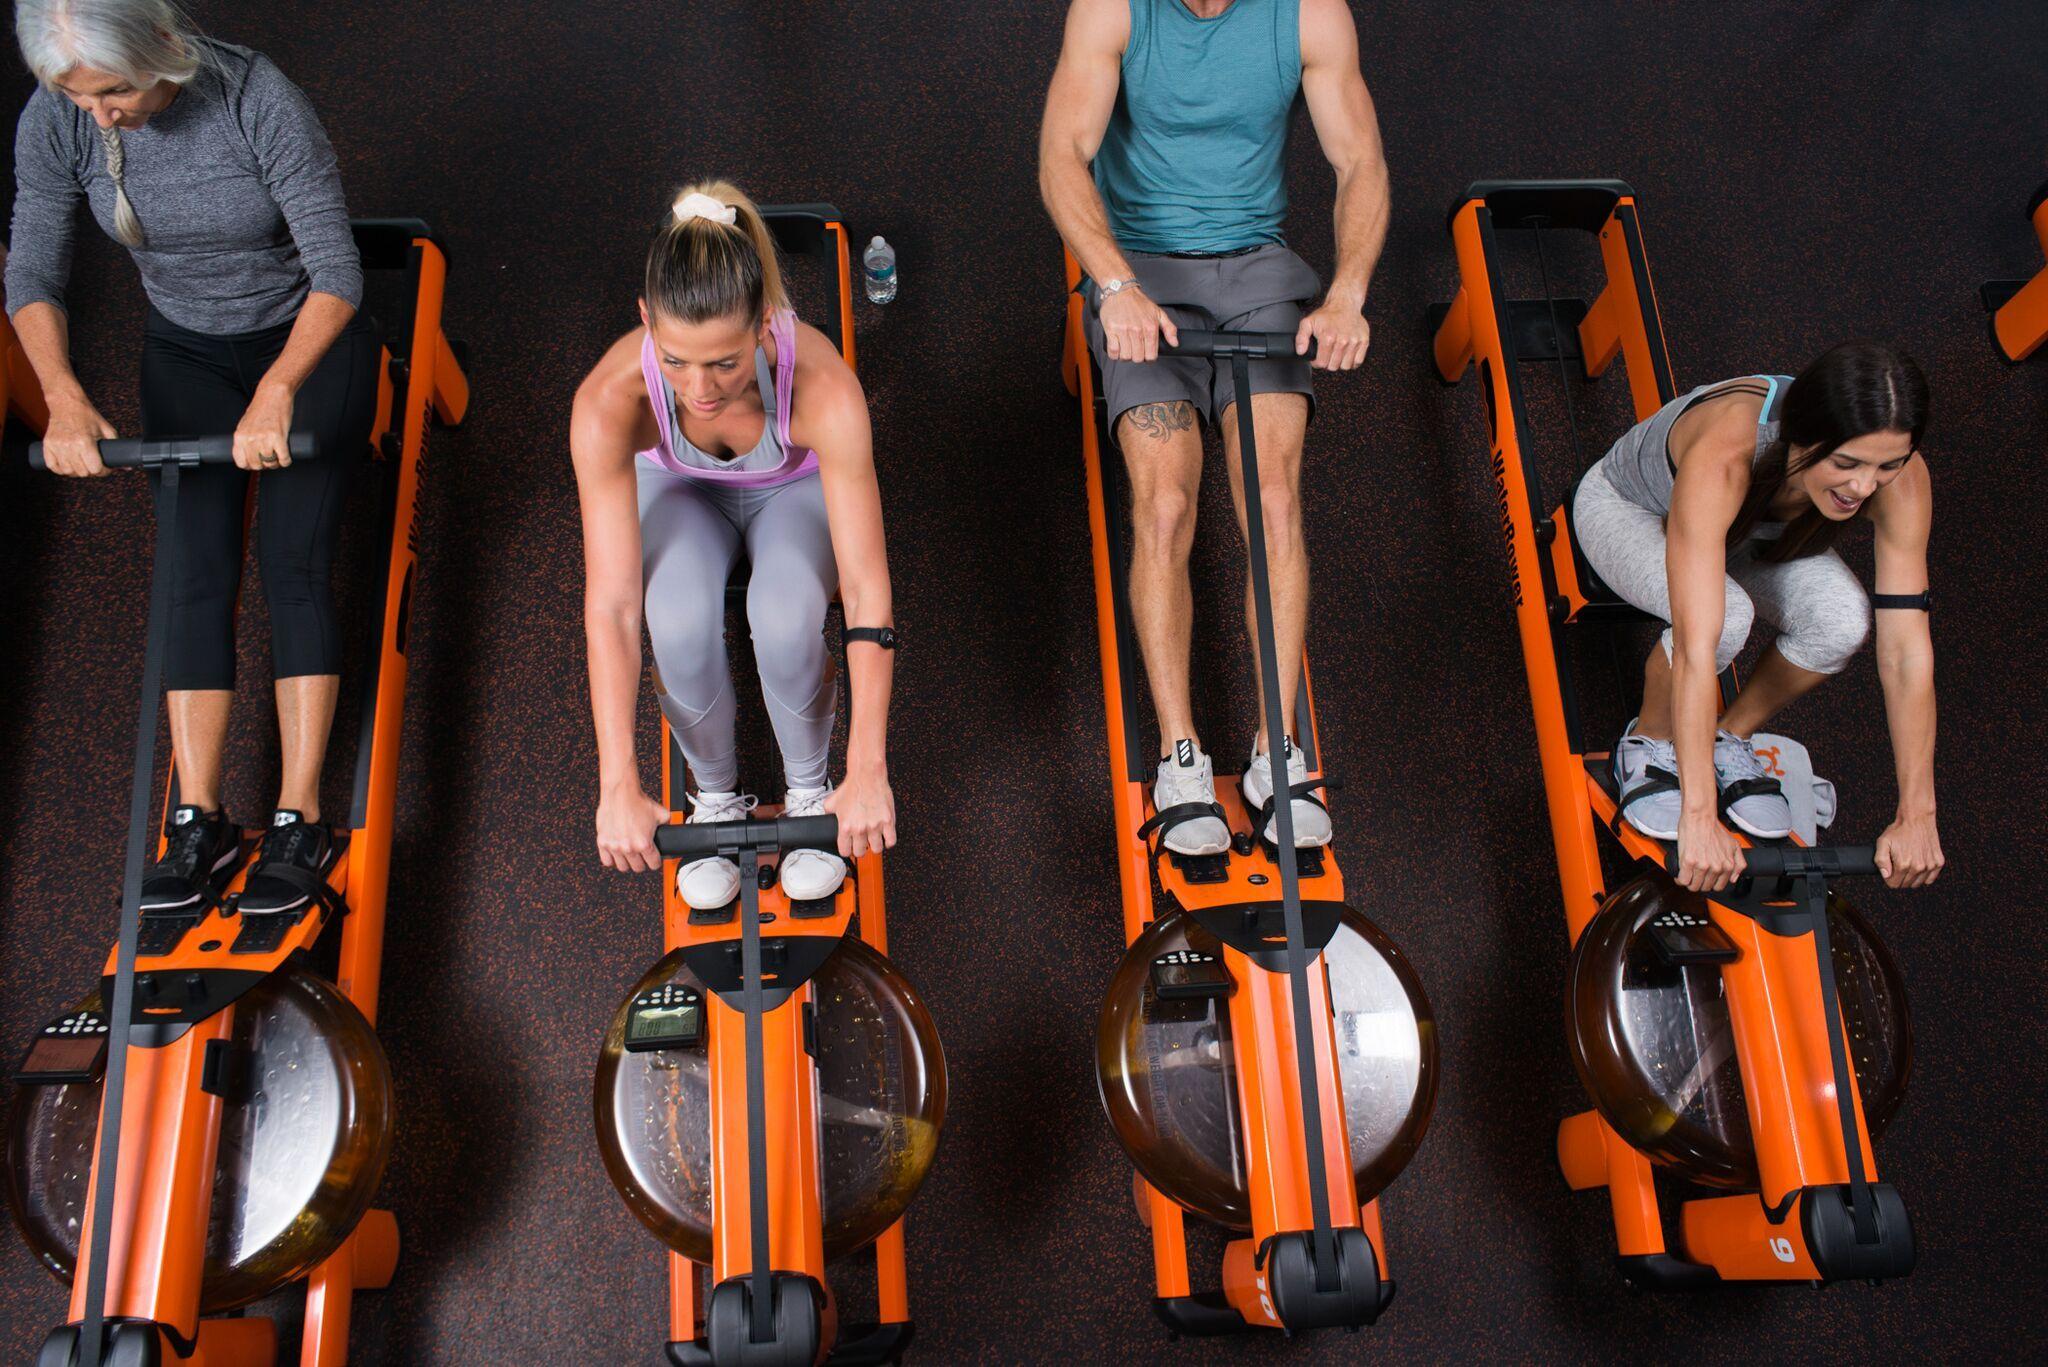 Concord Ma Fitness Gym Orangetheory Fitness Orange Theory Workout Gym Workouts Fitness